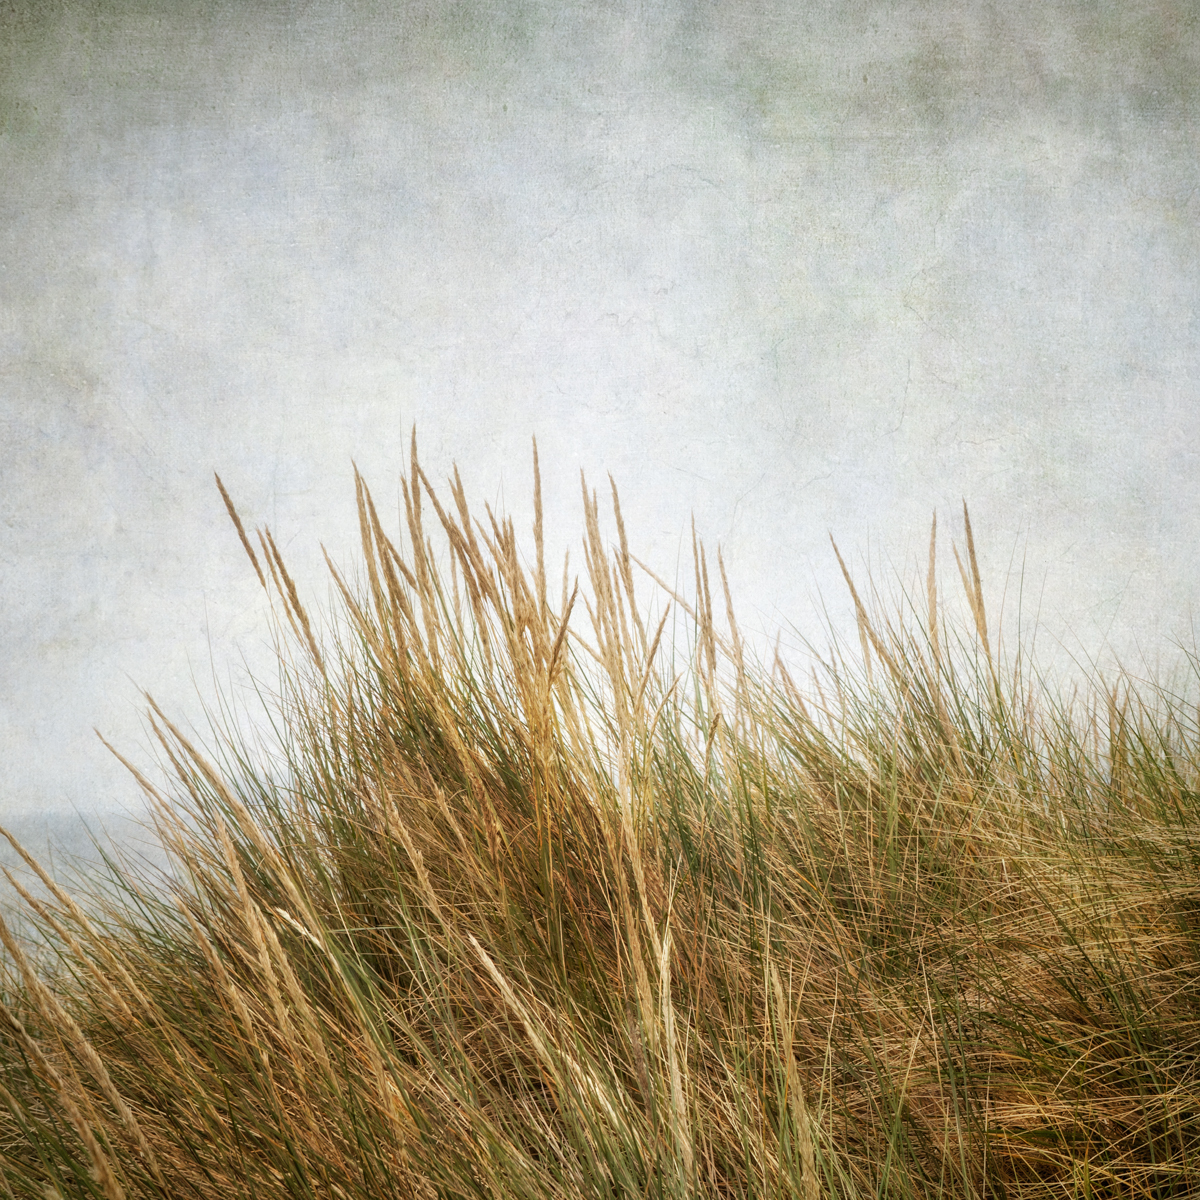 Beach Grass II (large view)